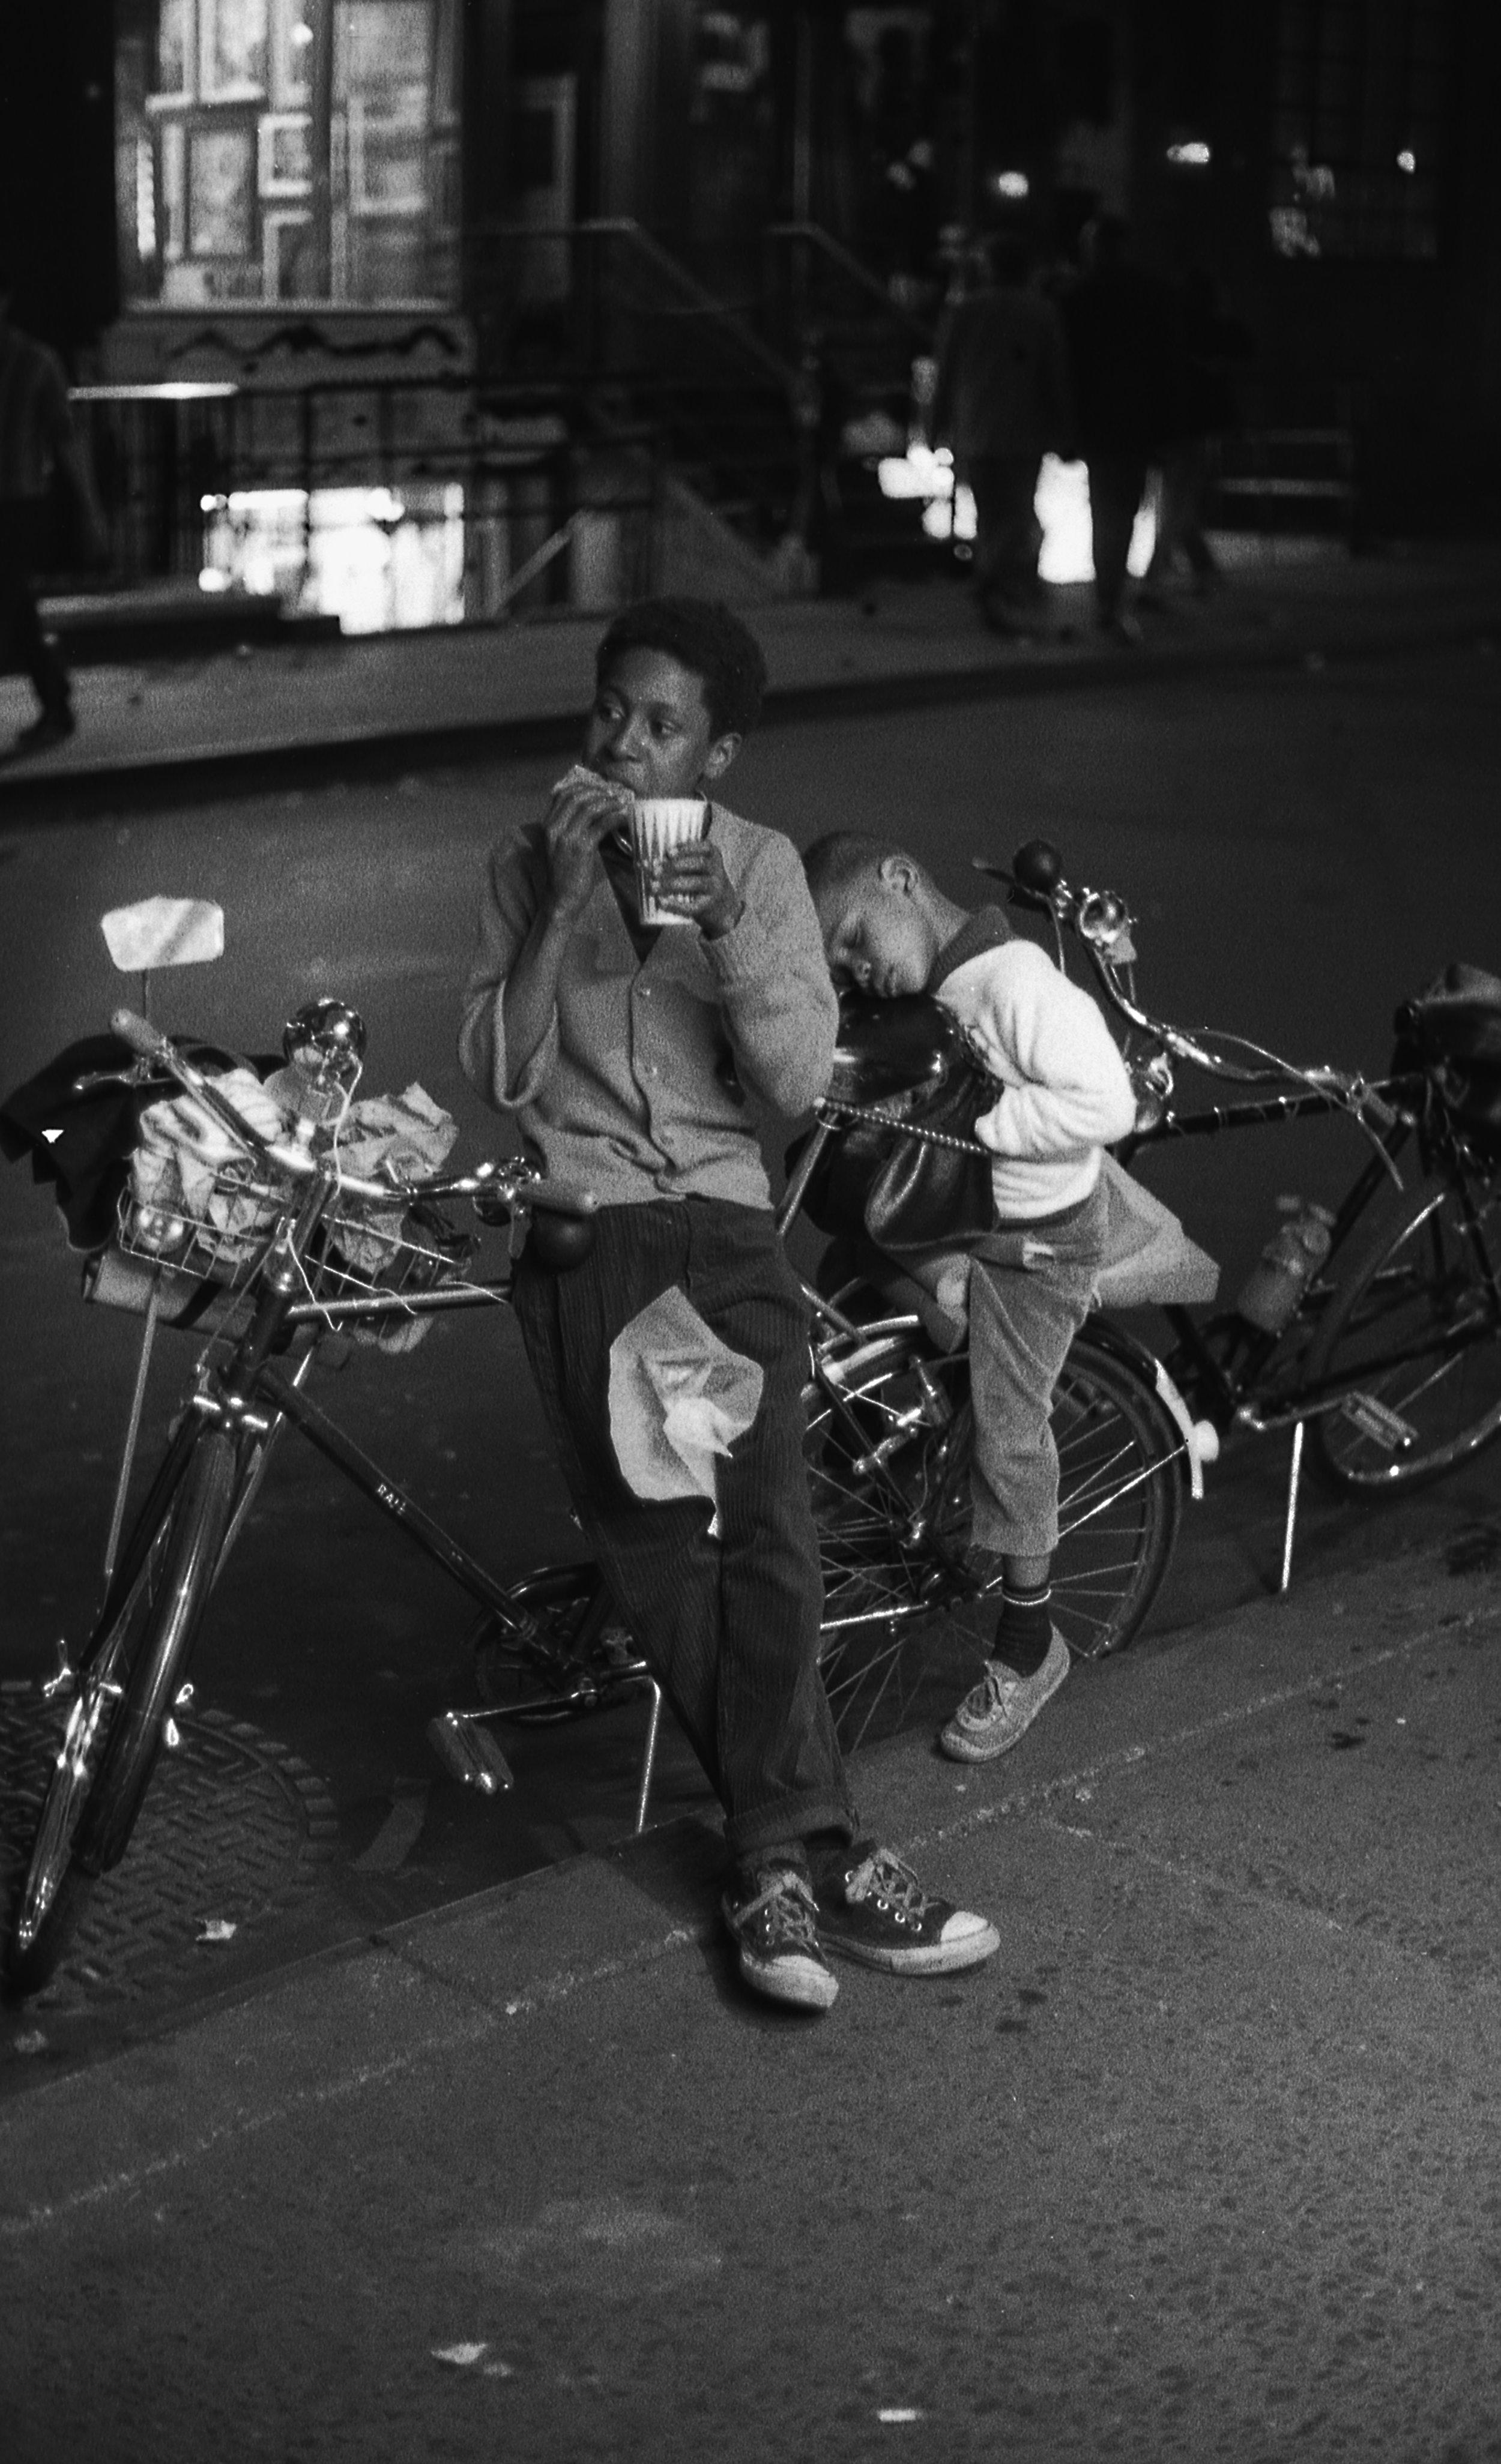 Boys on Bike